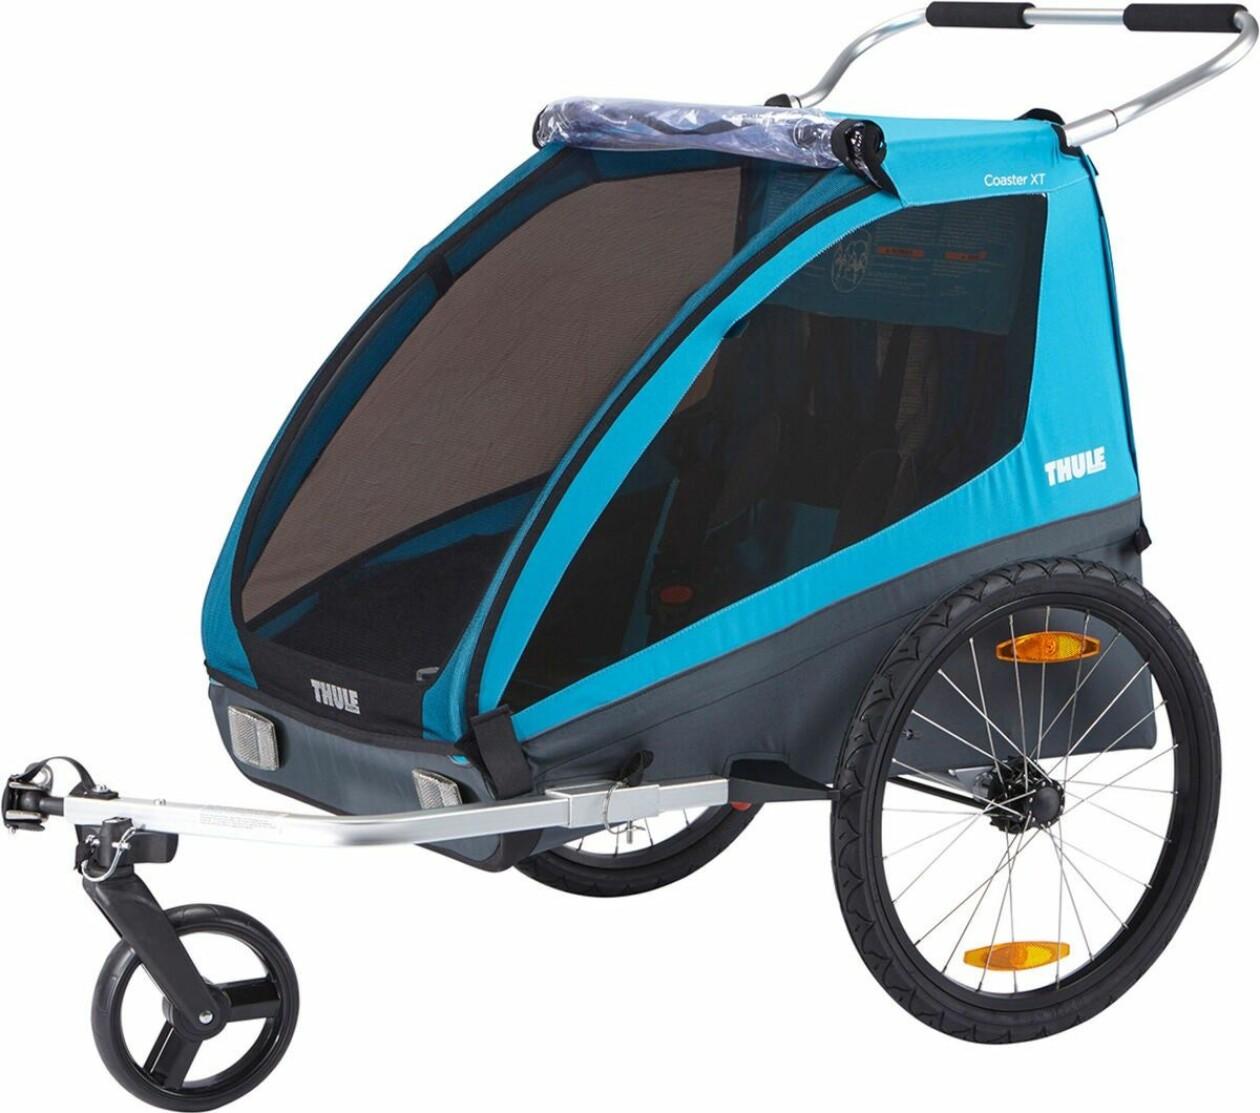 Thule Cykelvagn Coaster XT, Blue